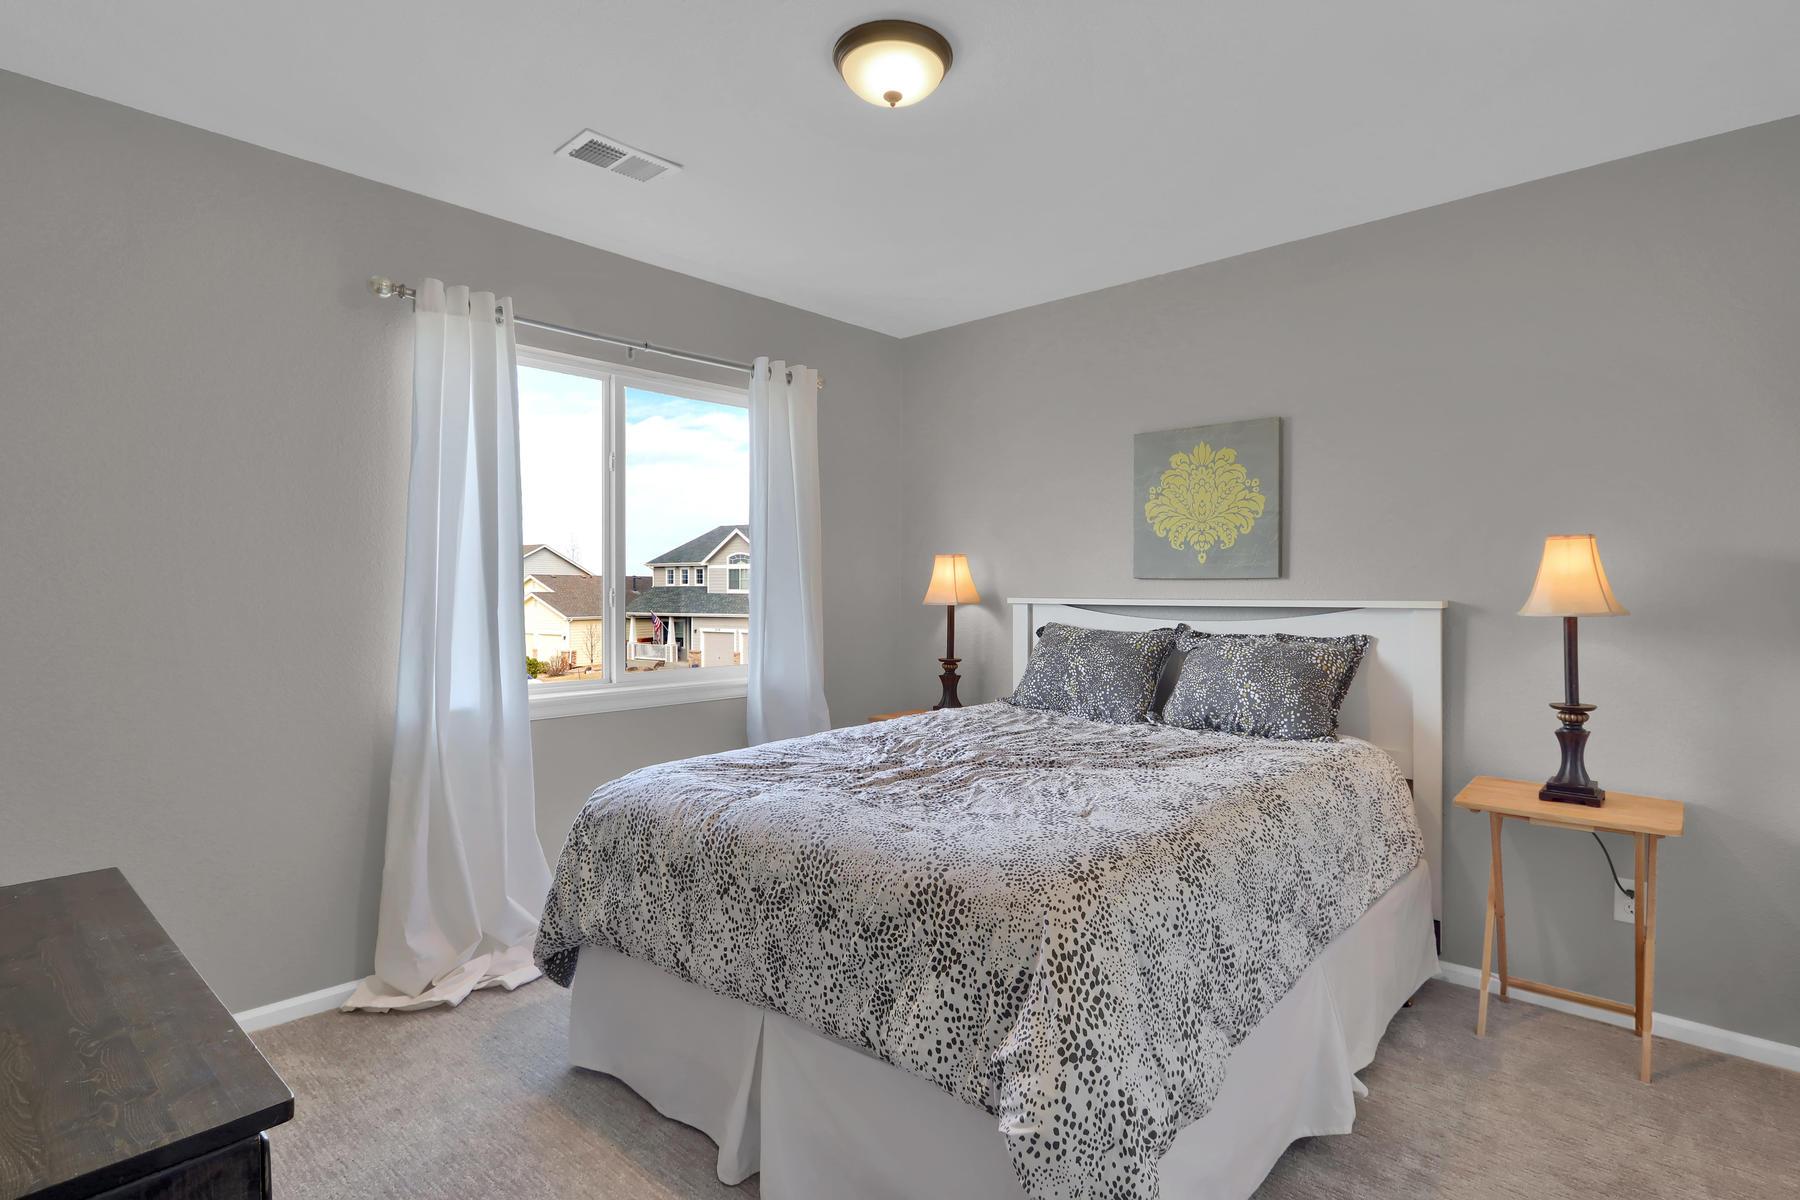 315 Andrew Dr Dacono CO 80514-019-24-Bedroom-MLS_Size.jpg